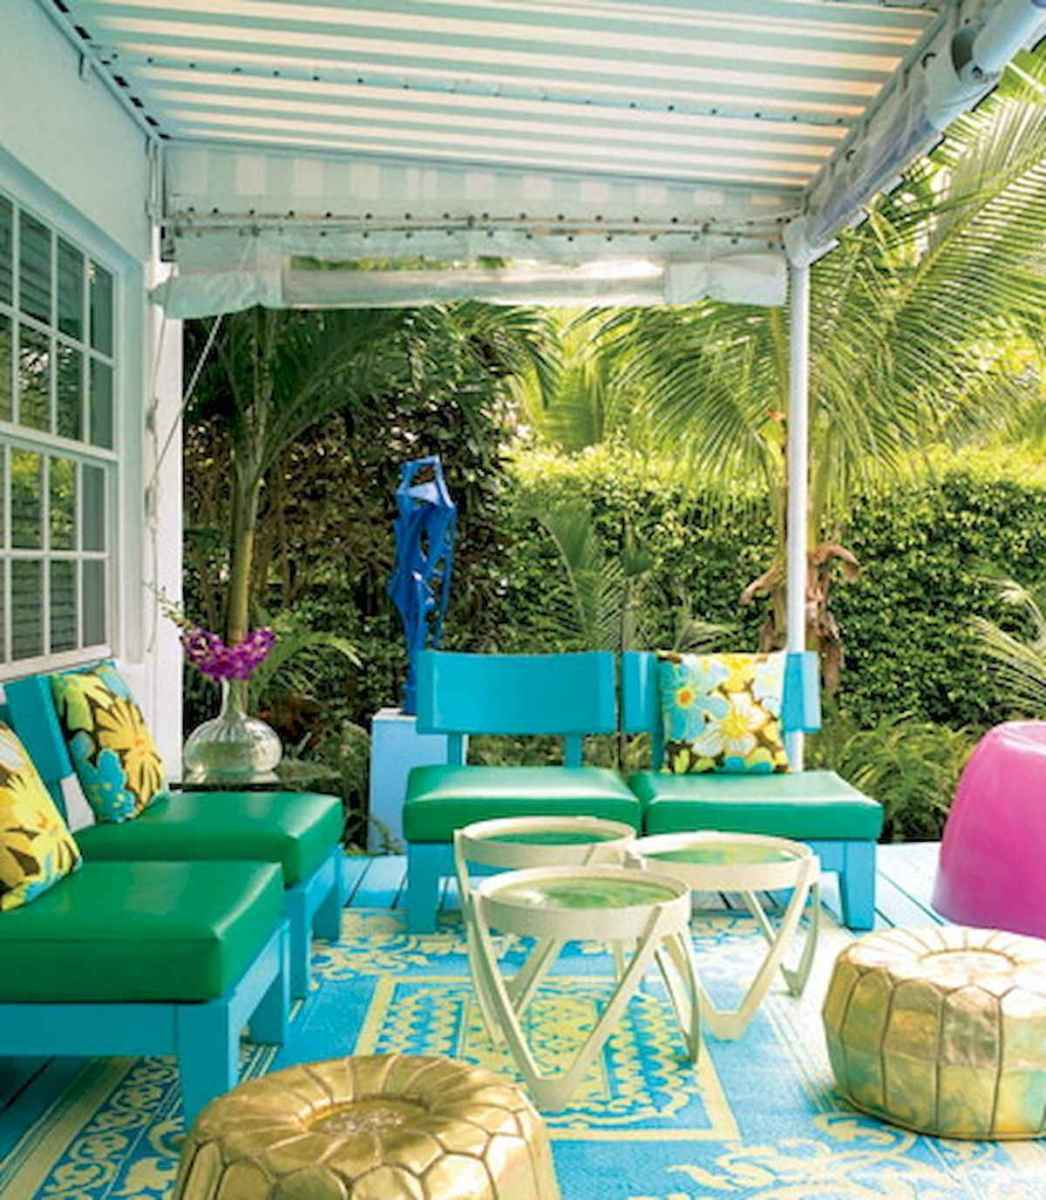 50 Awesome Summer Backyard Decor Ideas Make Your Summer Beautiful (3)